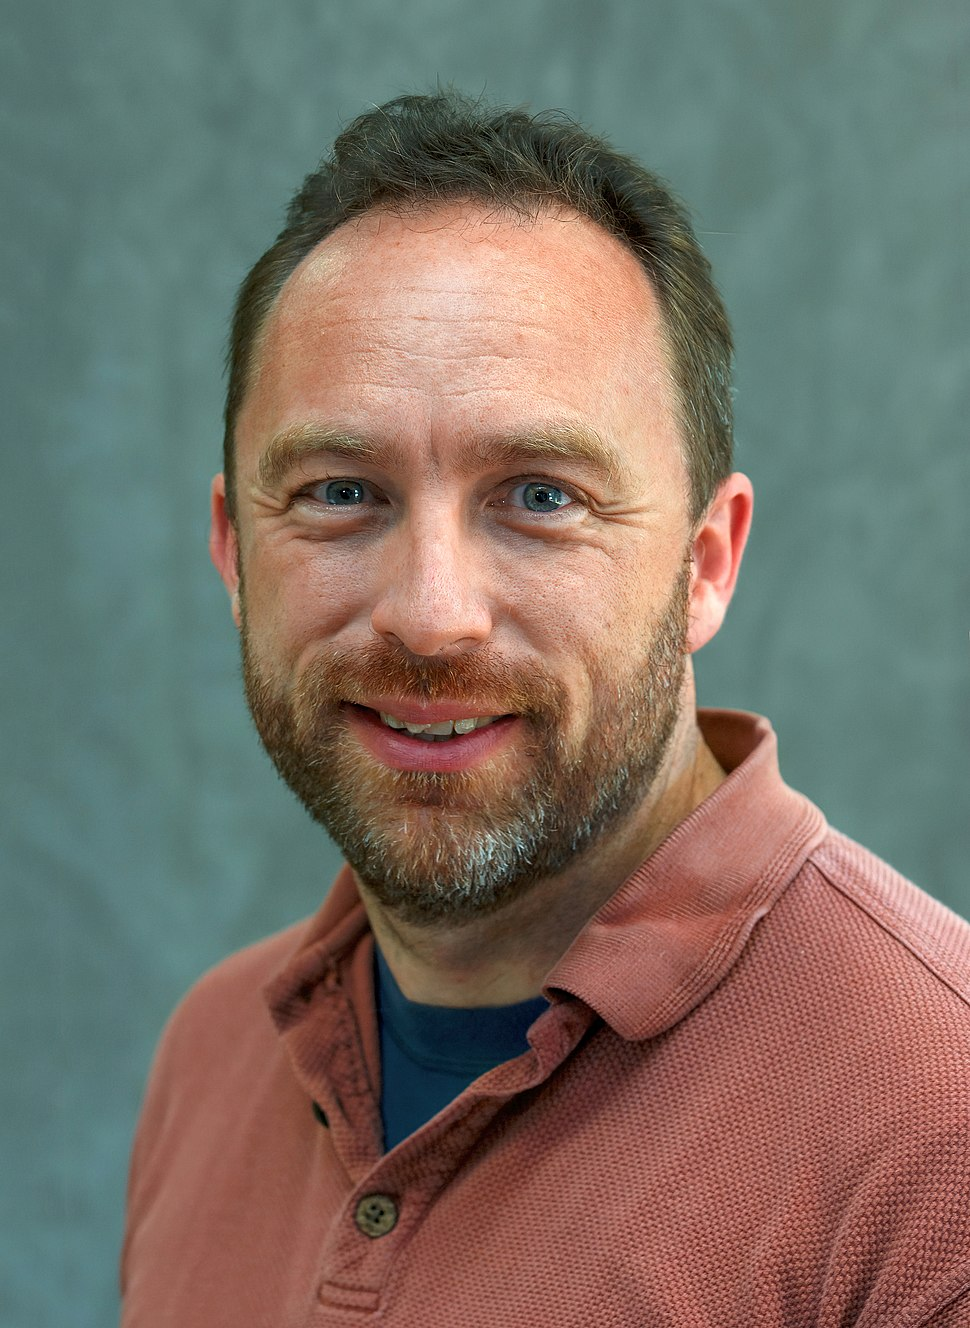 Jimmy Wales in August 2006